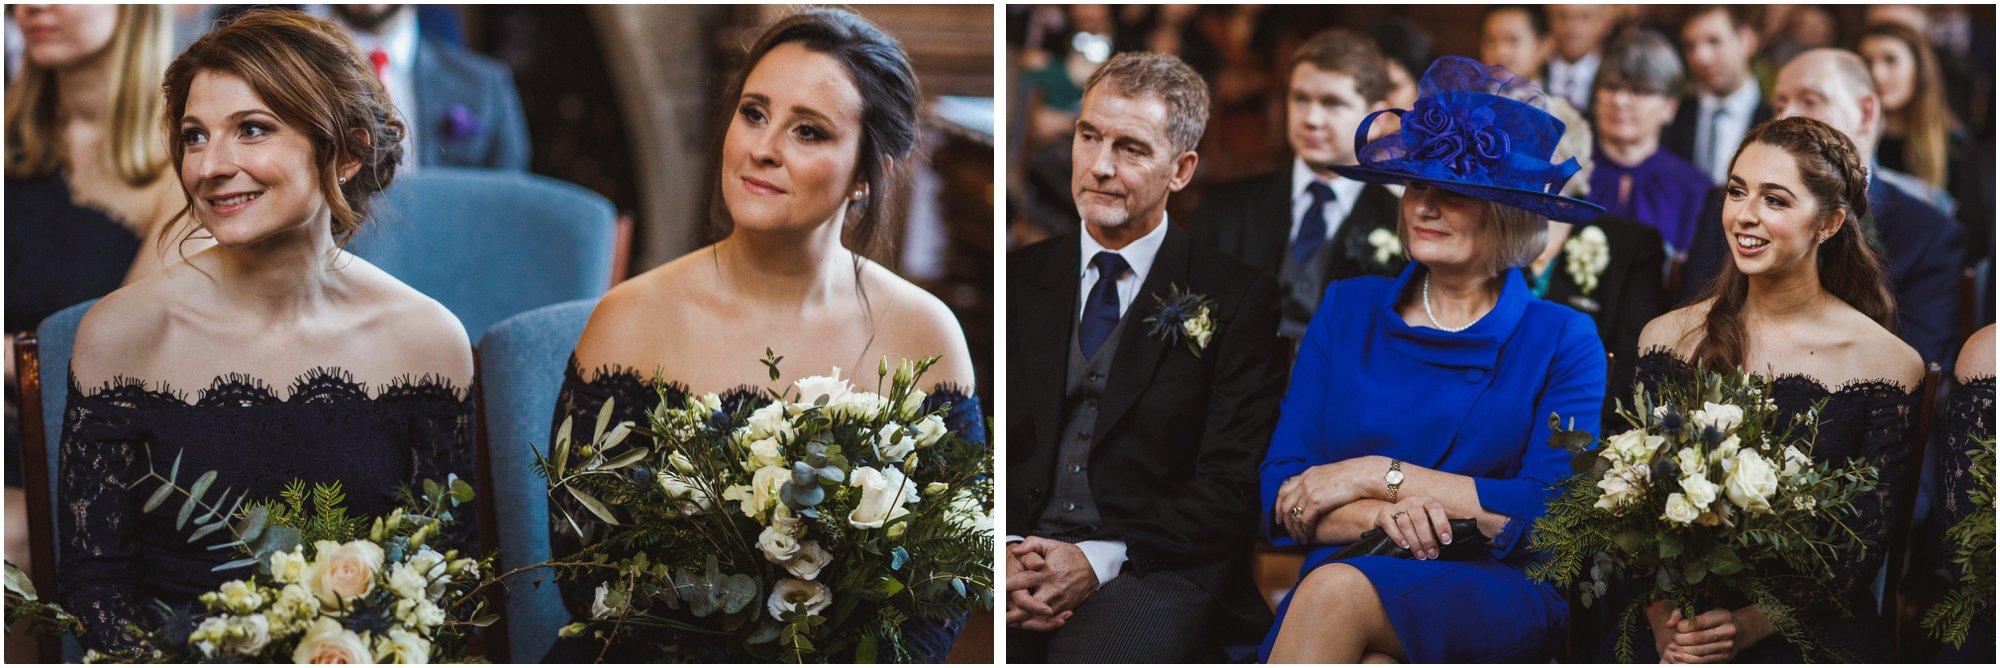 Burghley House Wedding Stamford_0055.jpg